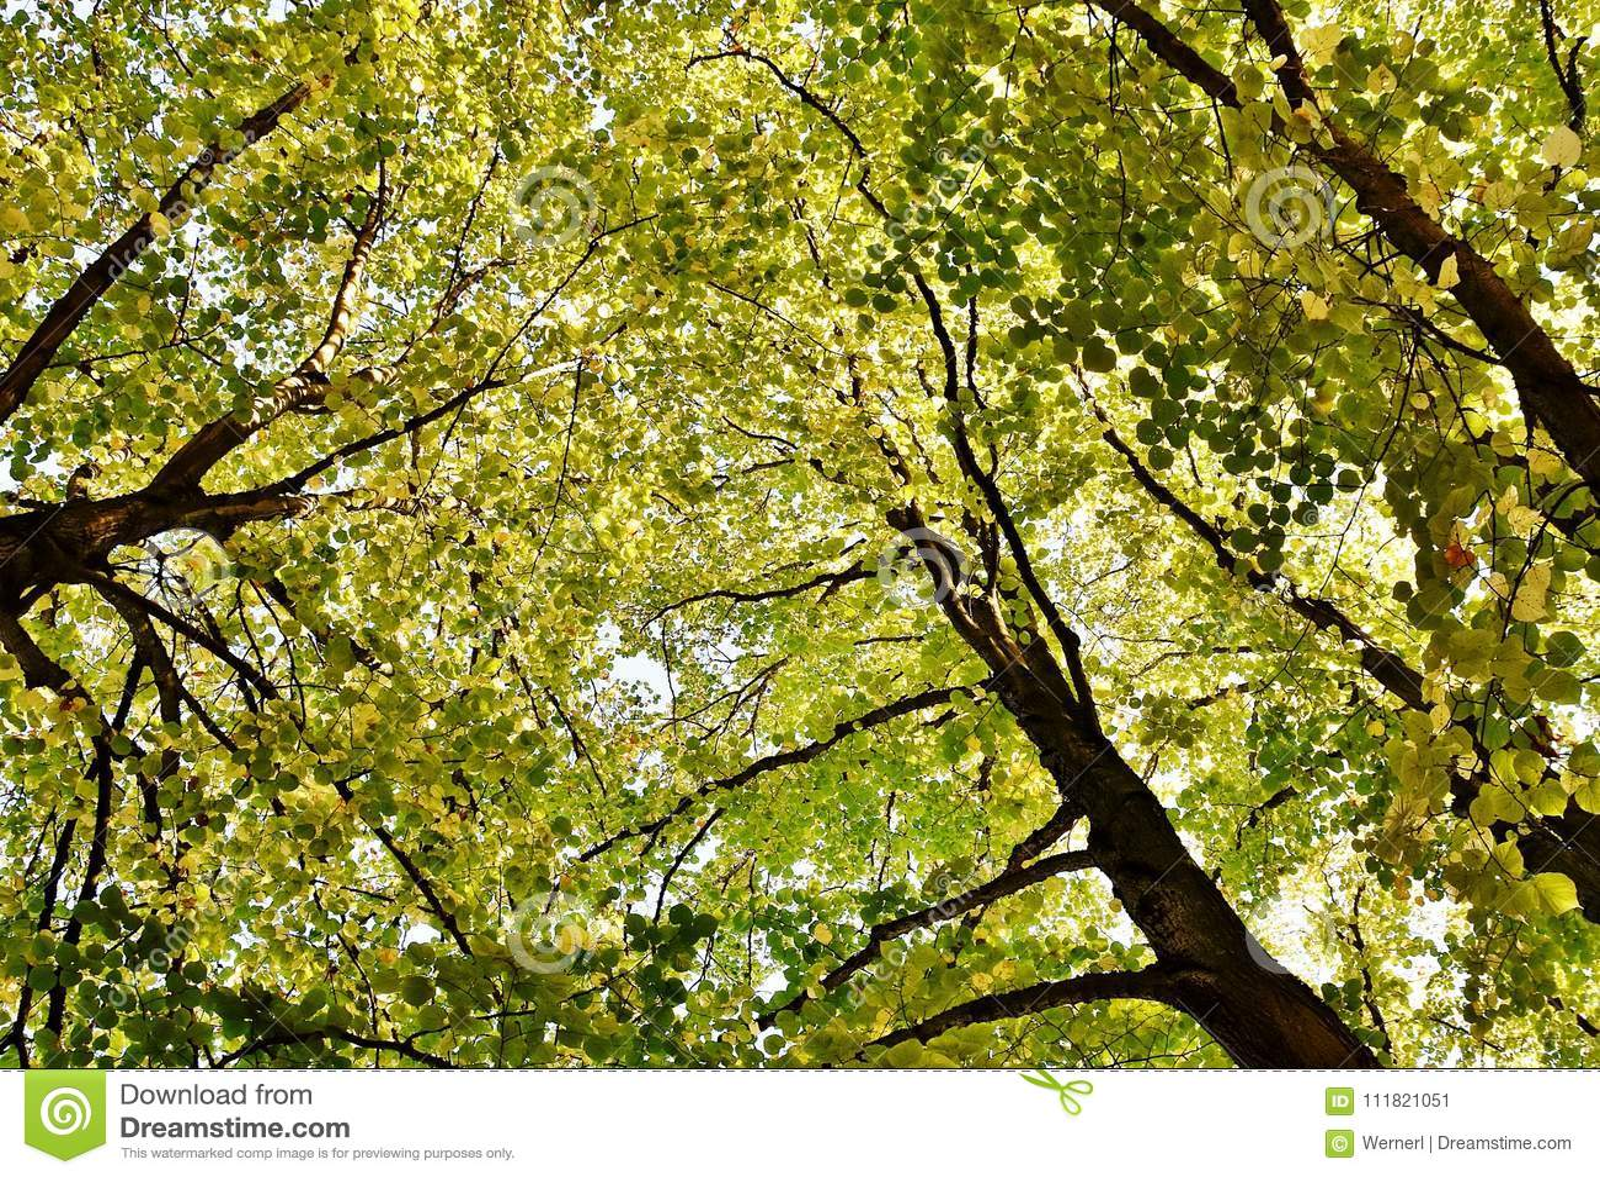 Autumn colored beech trees stock image. Image of orange - 111821051